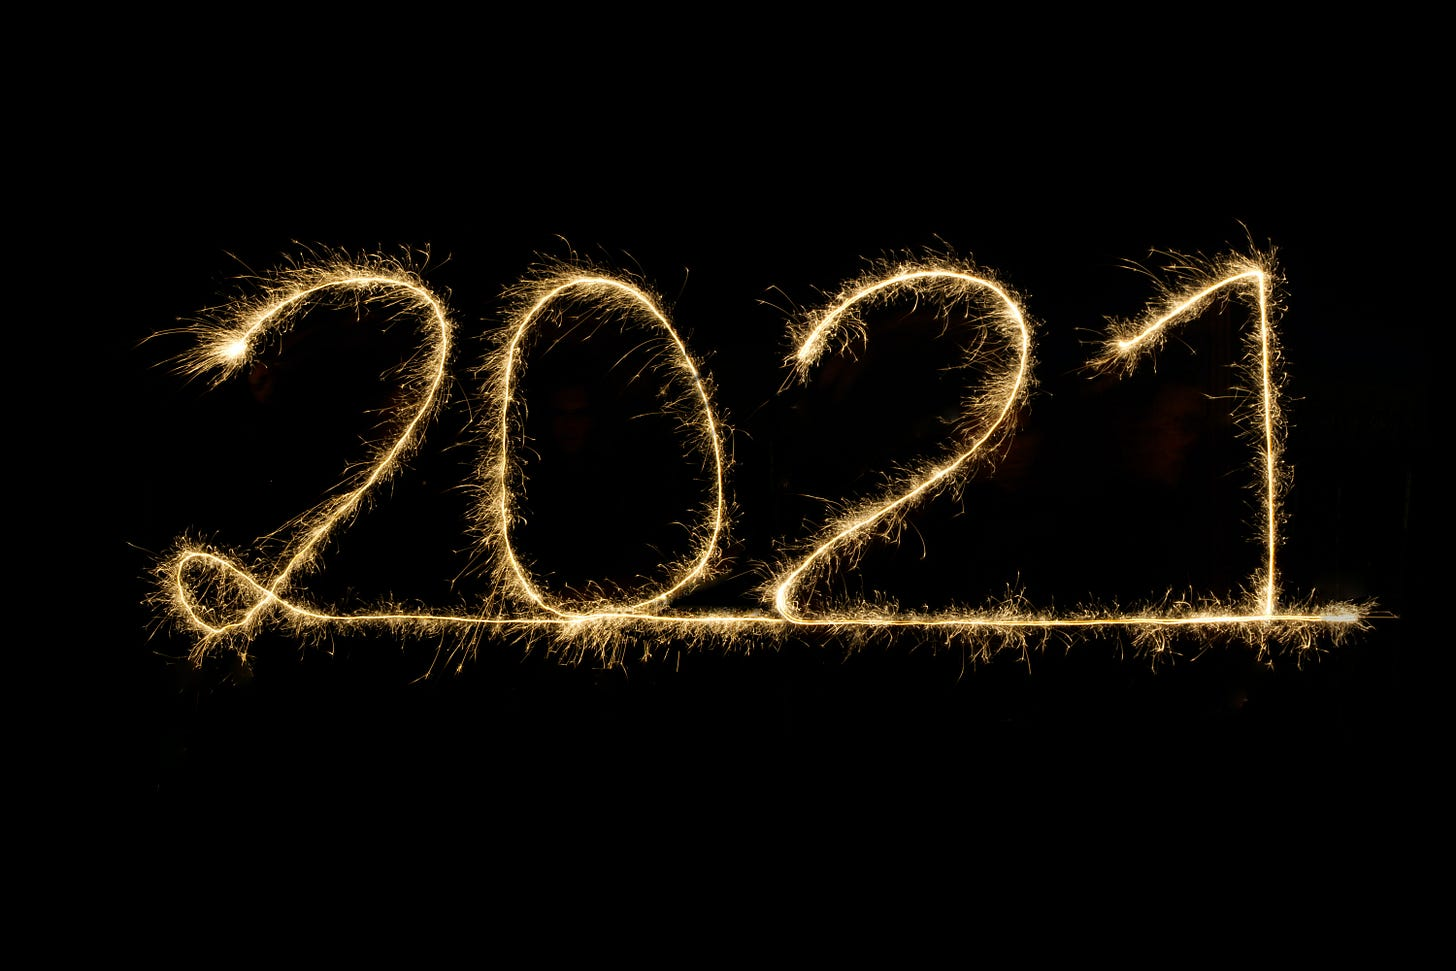 2021 in lights / Moritz Knöringer / Unsplash